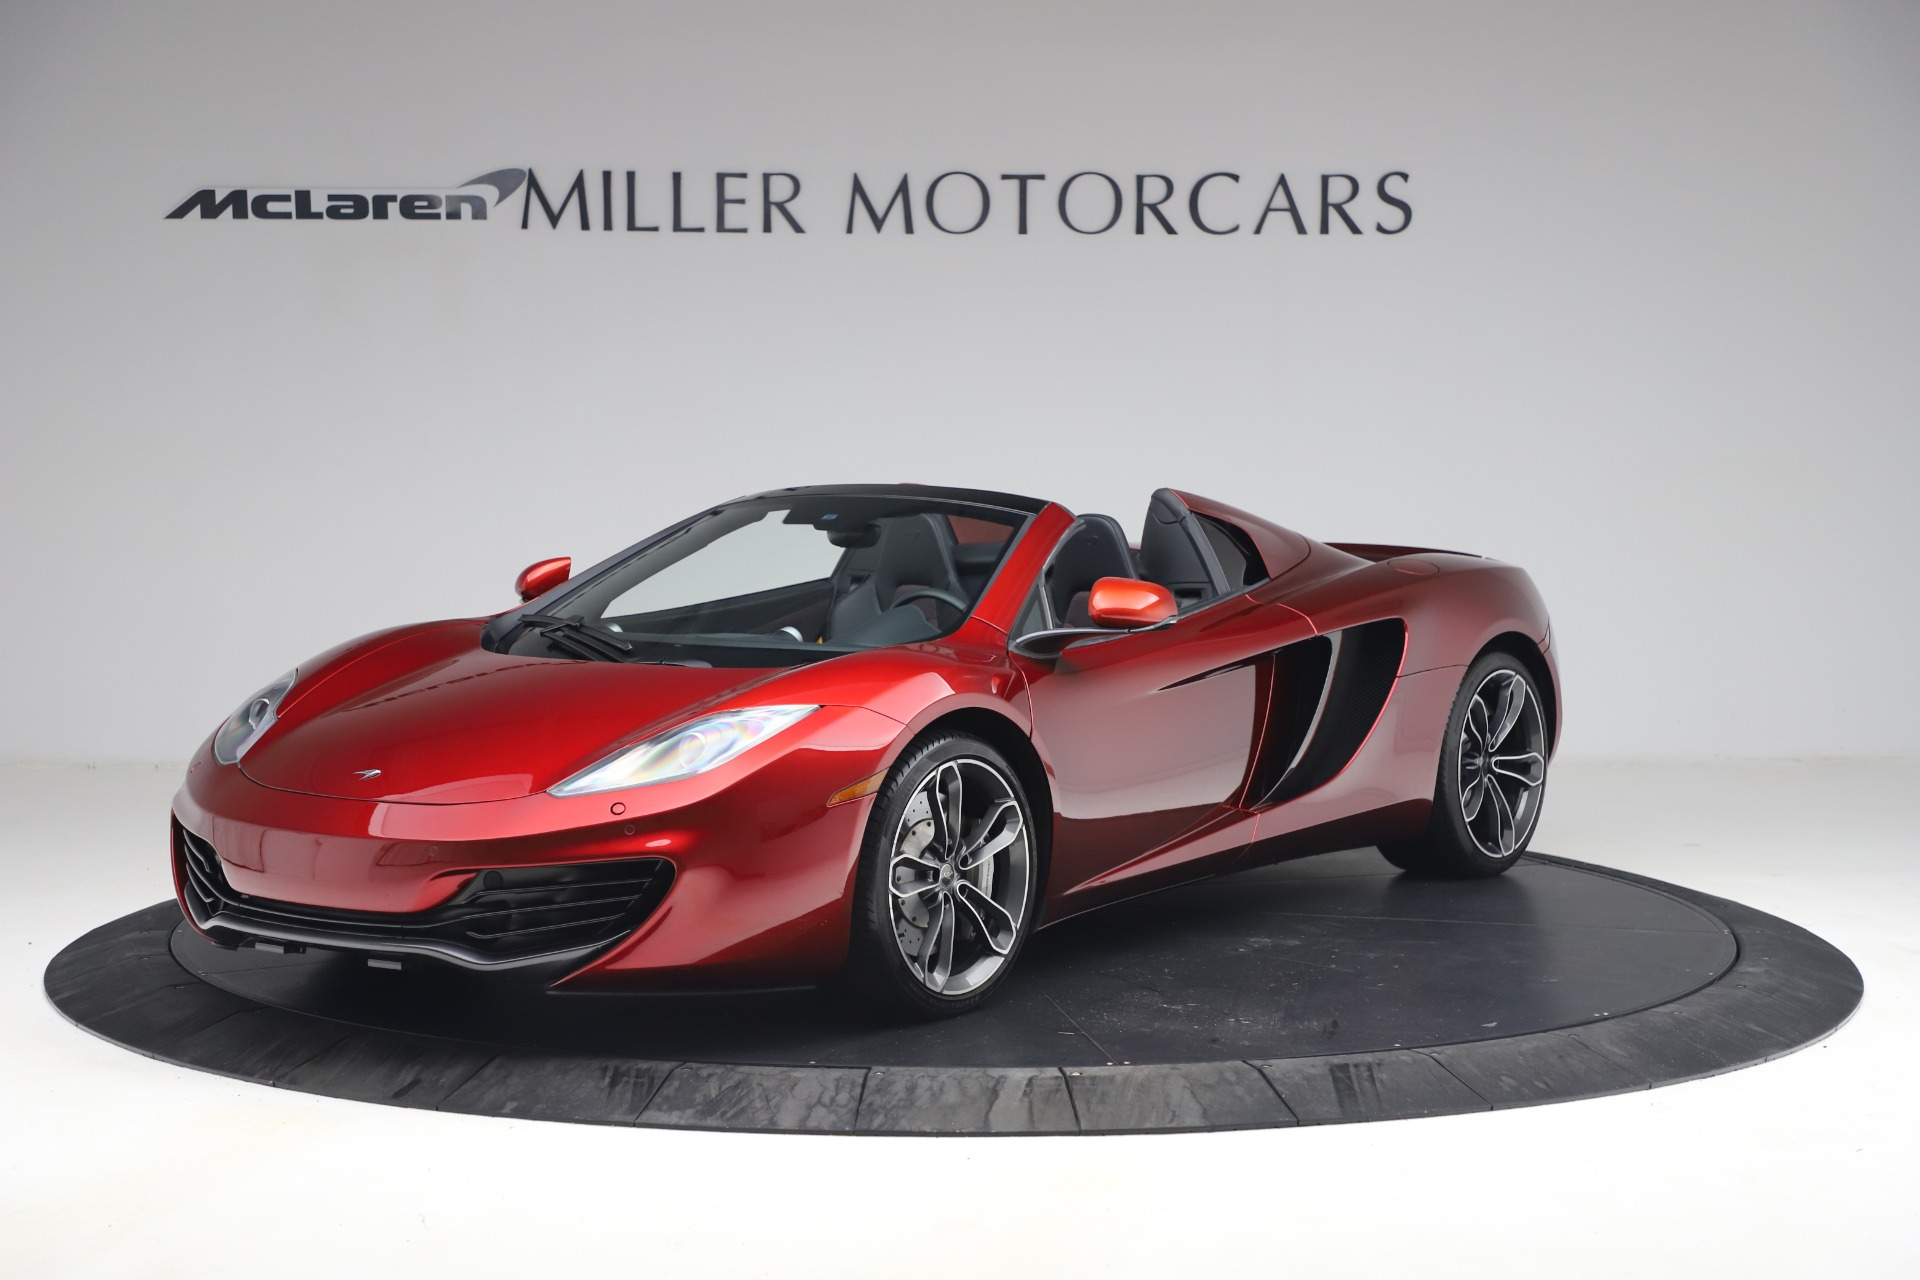 Used 2013 McLaren MP4-12C Spider for sale $134,900 at McLaren Greenwich in Greenwich CT 06830 1